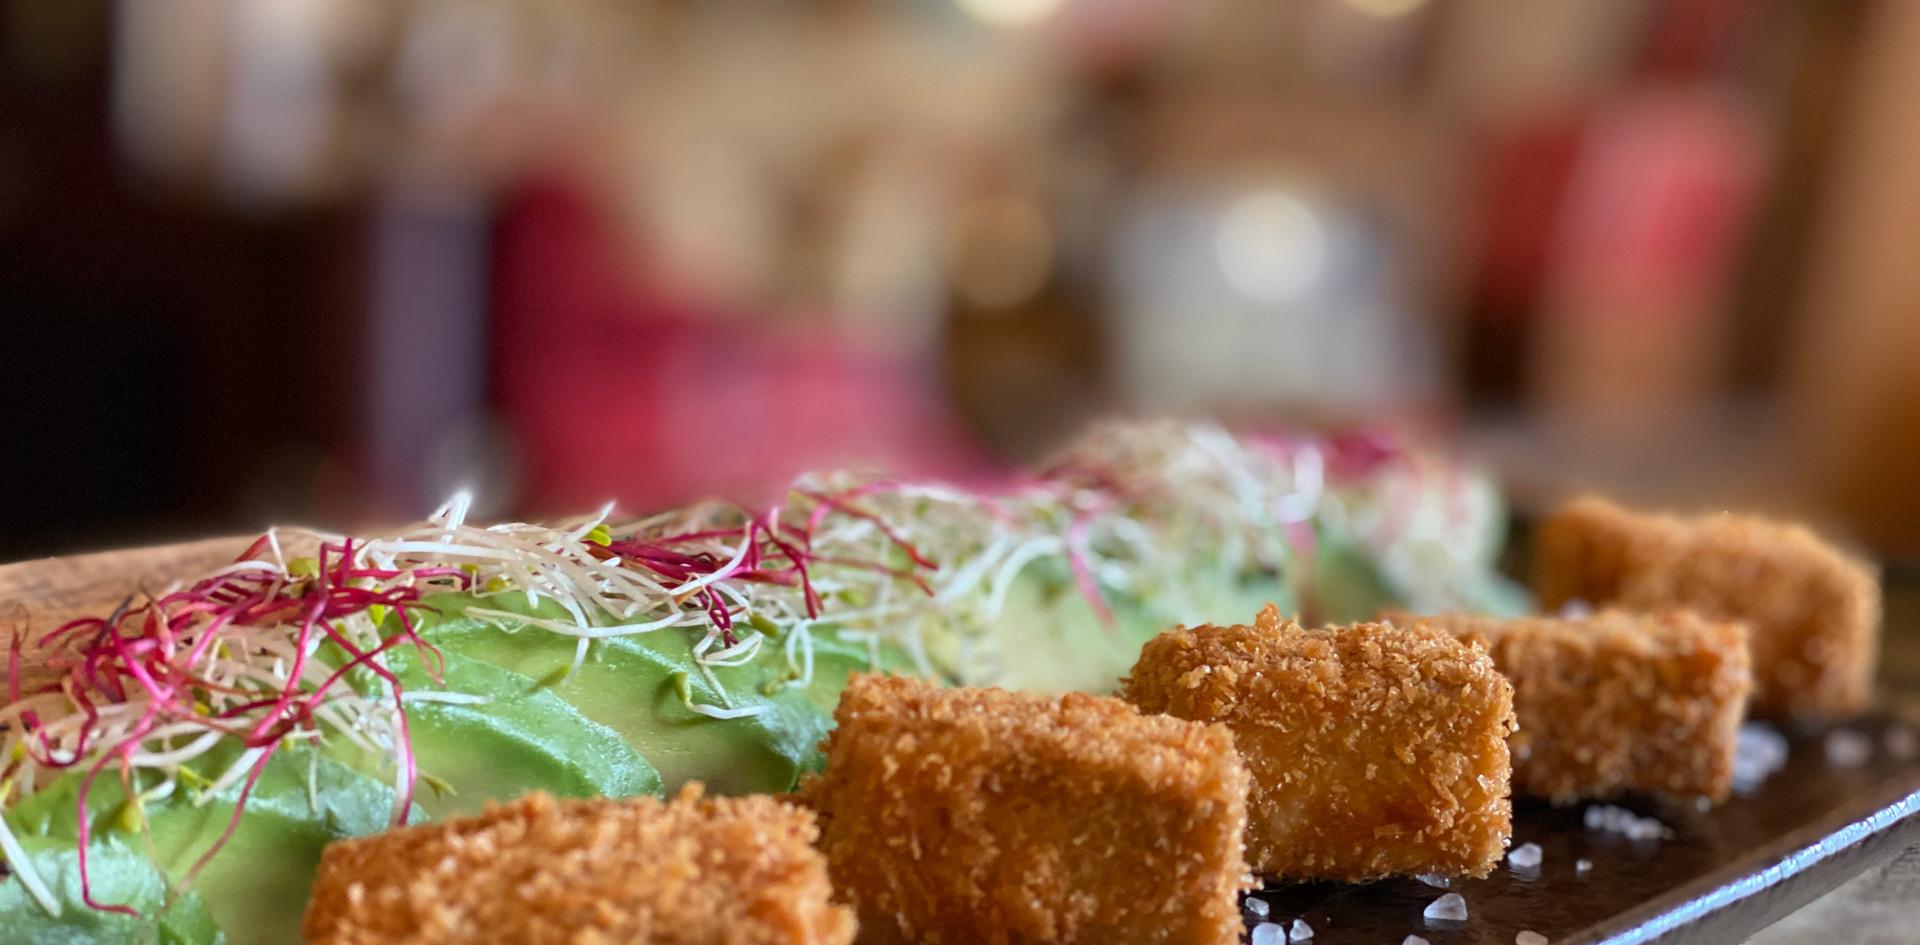 gebackener Tofu Restaurant Dinner - Hotel Wegner - The culinary Art Hotel